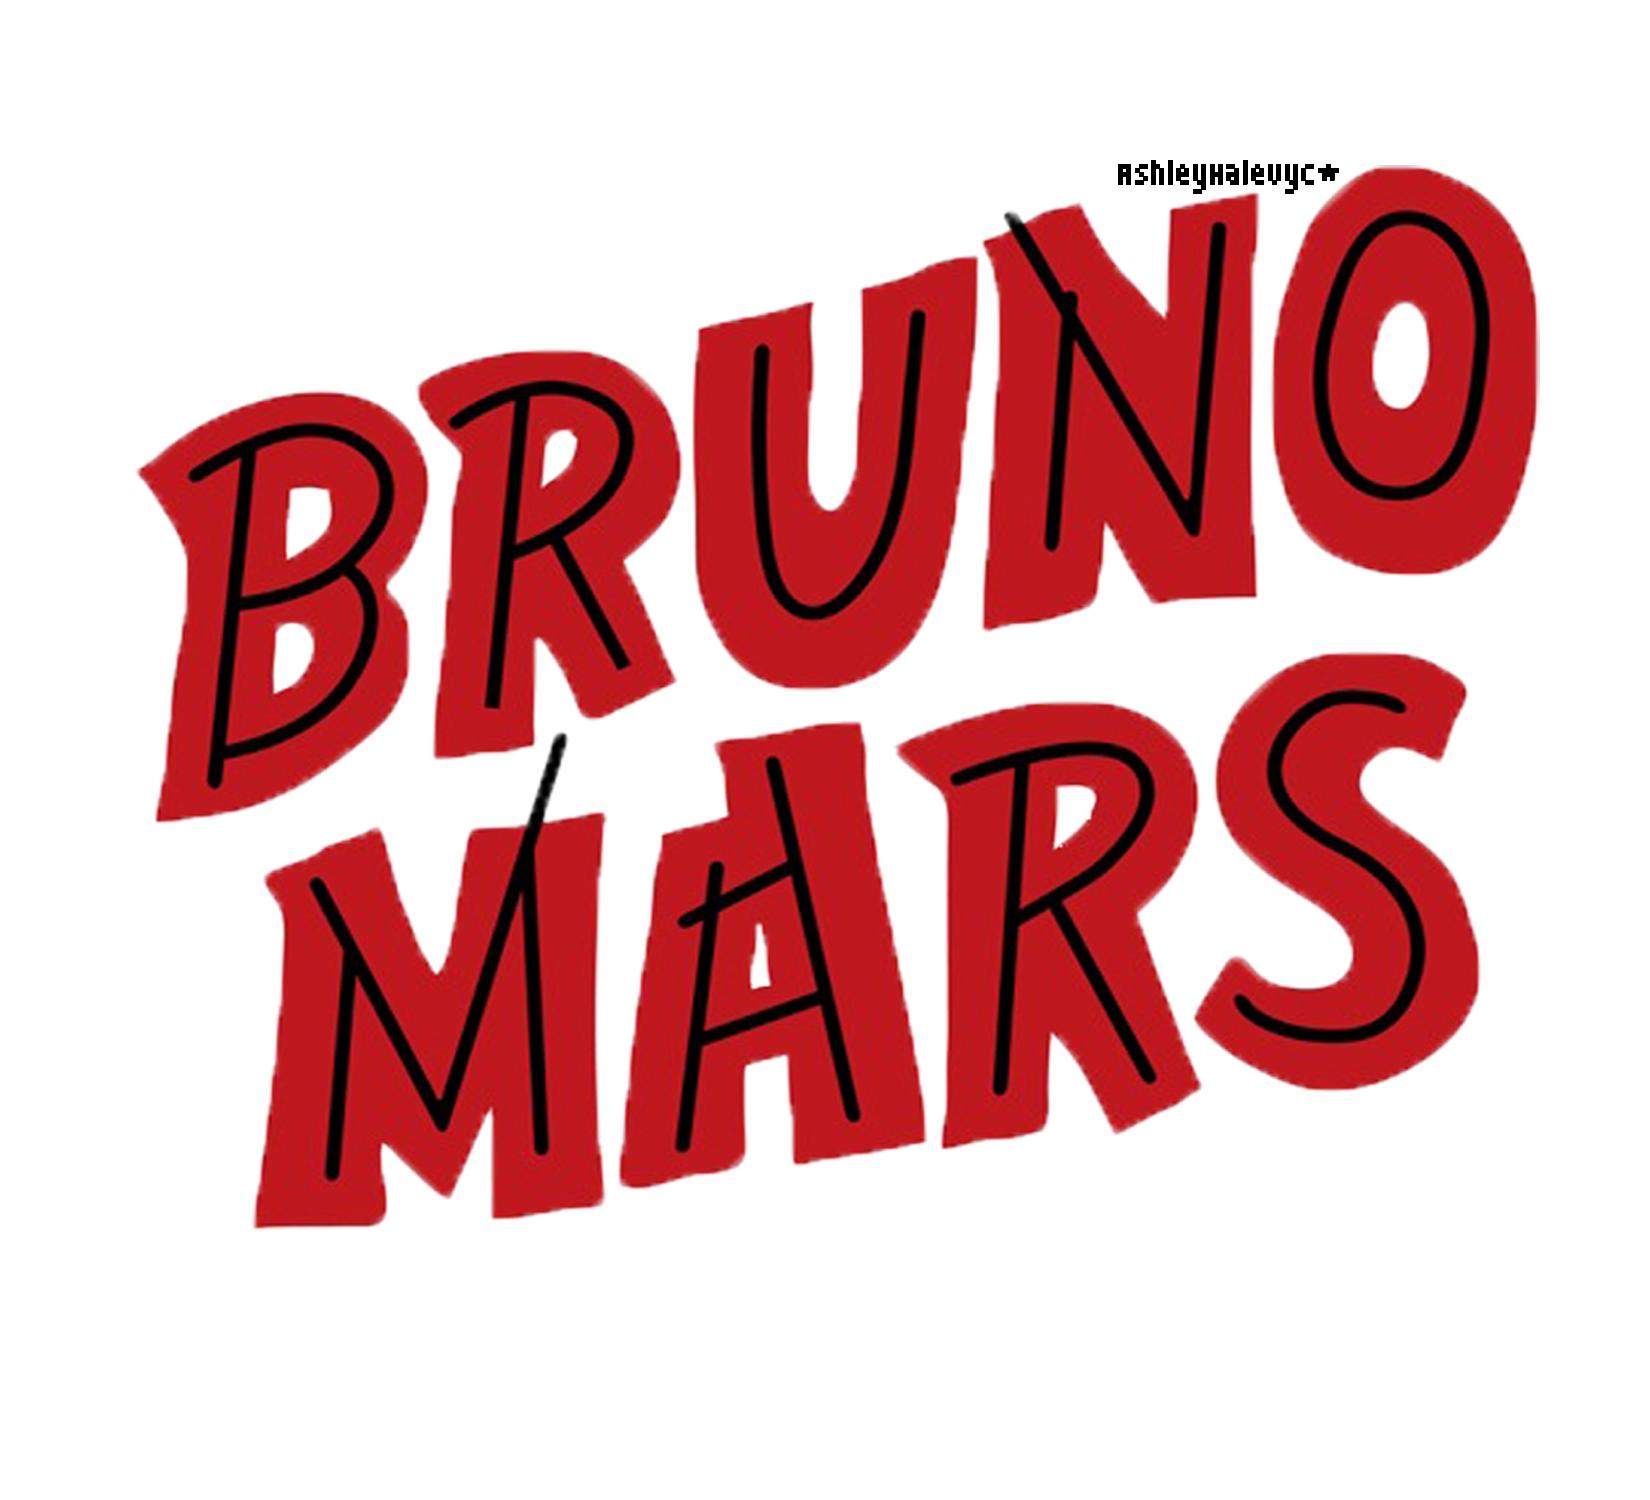 Bruno Mars Logo PNG by DestinyRawrMars on DeviantArt: destinyrawrmars.deviantart.com/art/Bruno-Mars-Logo-PNG-313281707